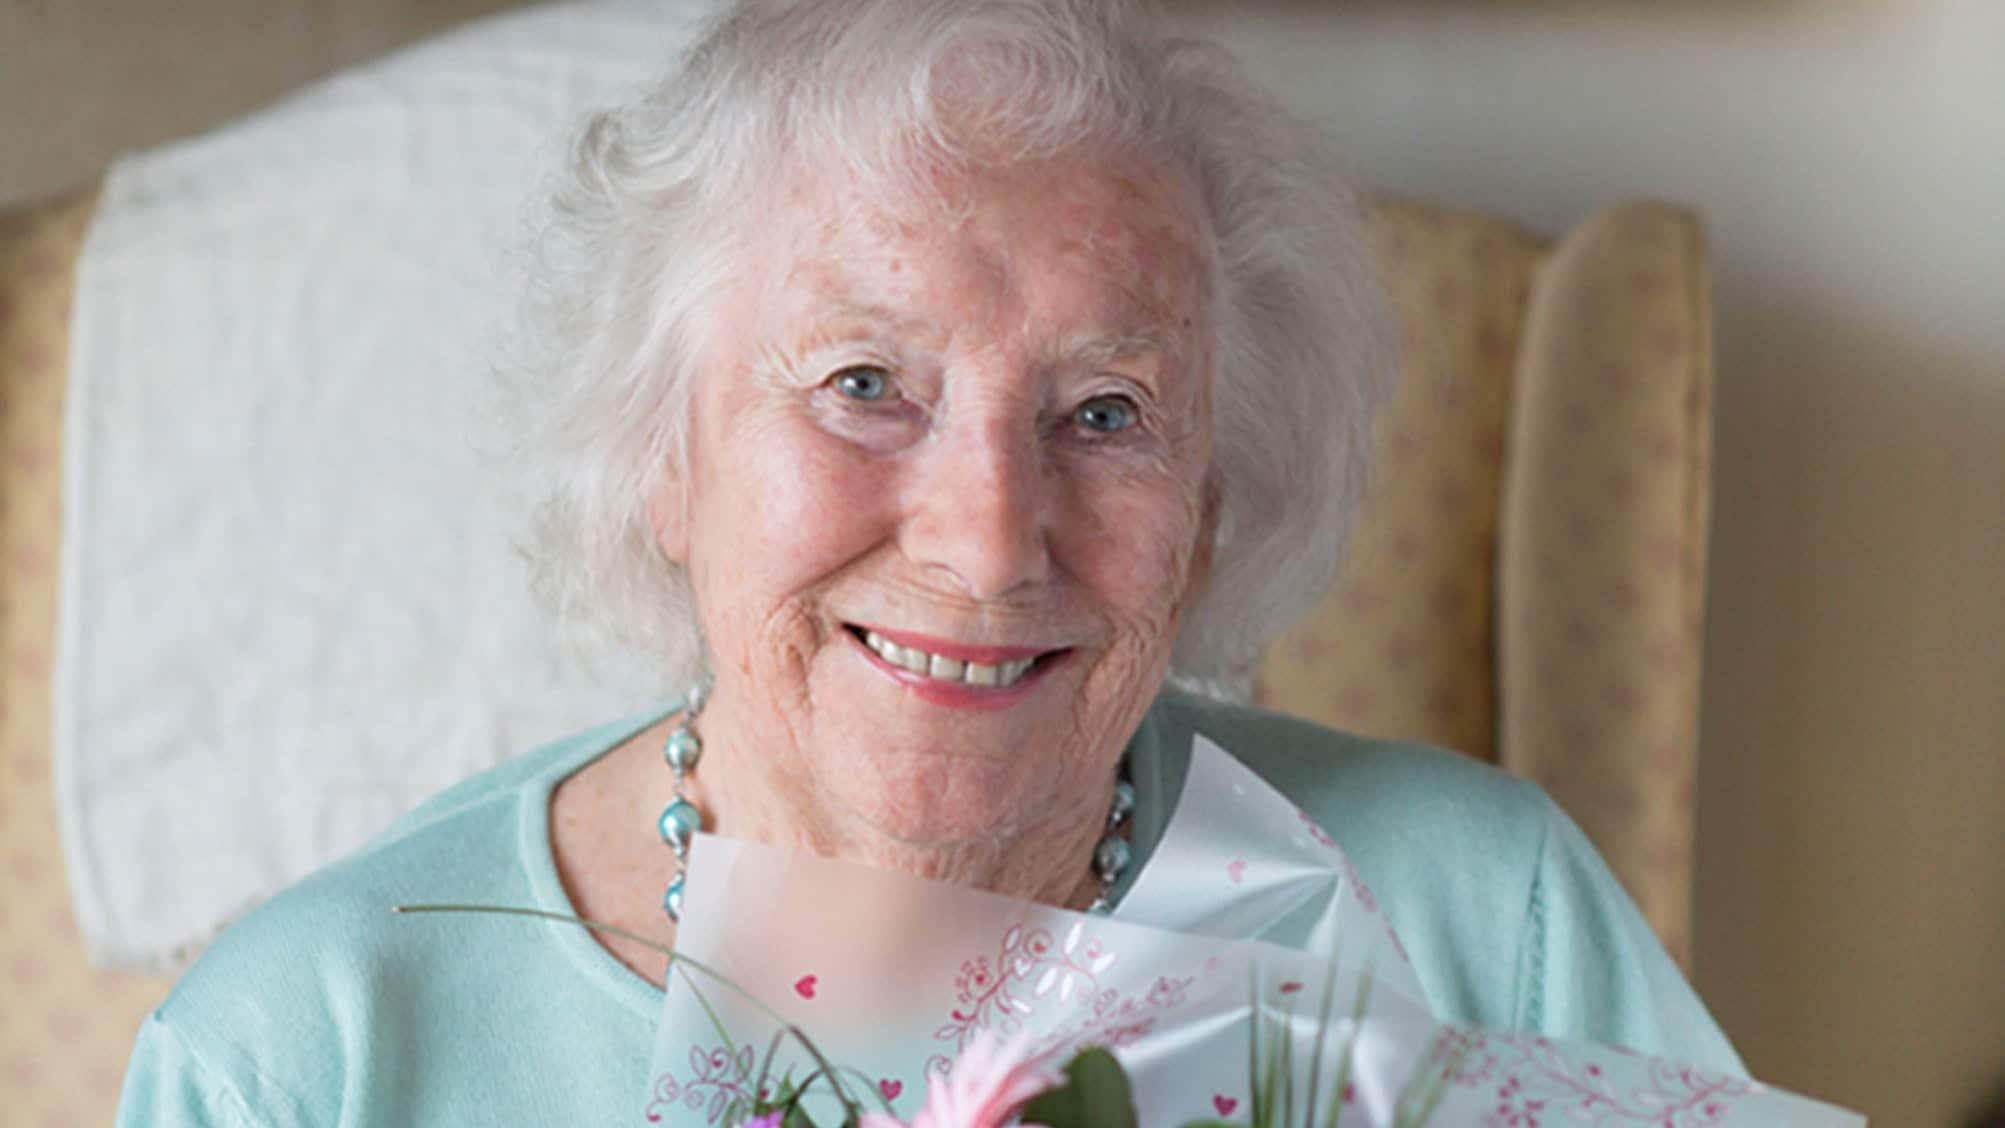 Dame Vera Lynn, 103, says 'keep smiling and keep singing'